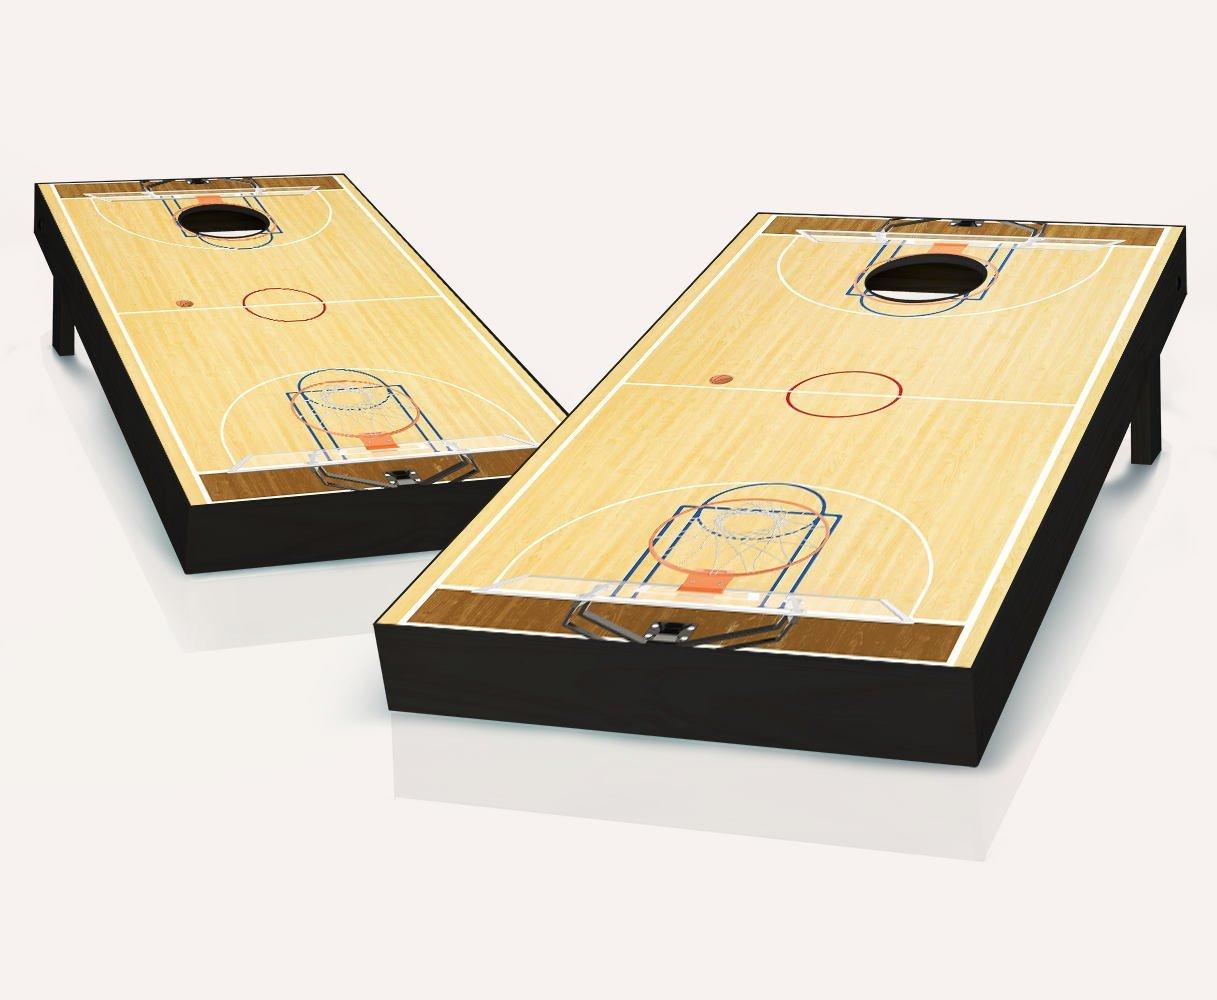 BASKETBALL Full Court Cornhole Boards Regulation Size Game Set Baggo Bean Bag Toss + 8 ACA Regulation Bags